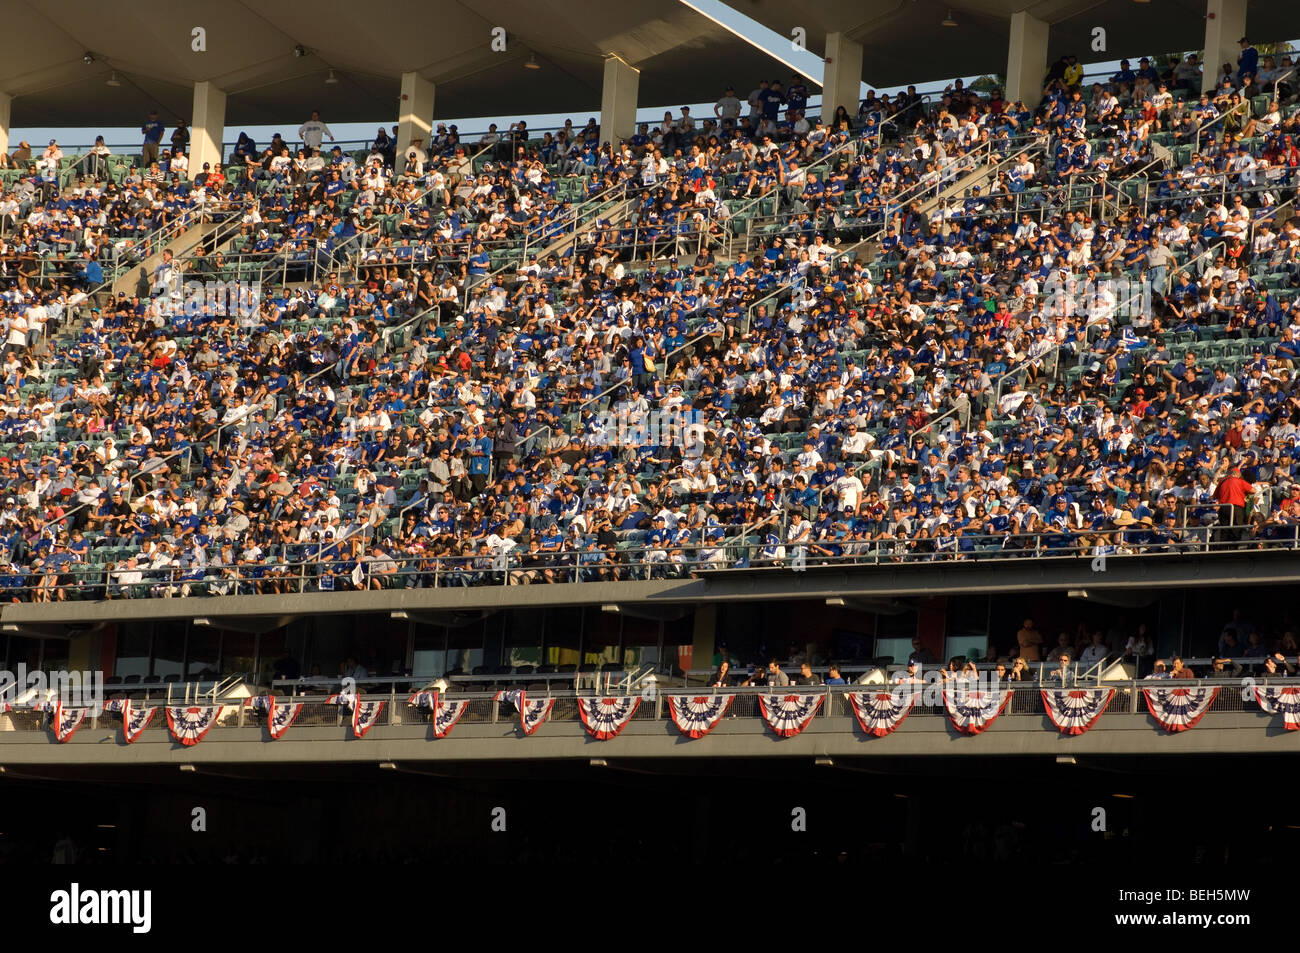 Fans at  Dodger Stadium - Stock Image